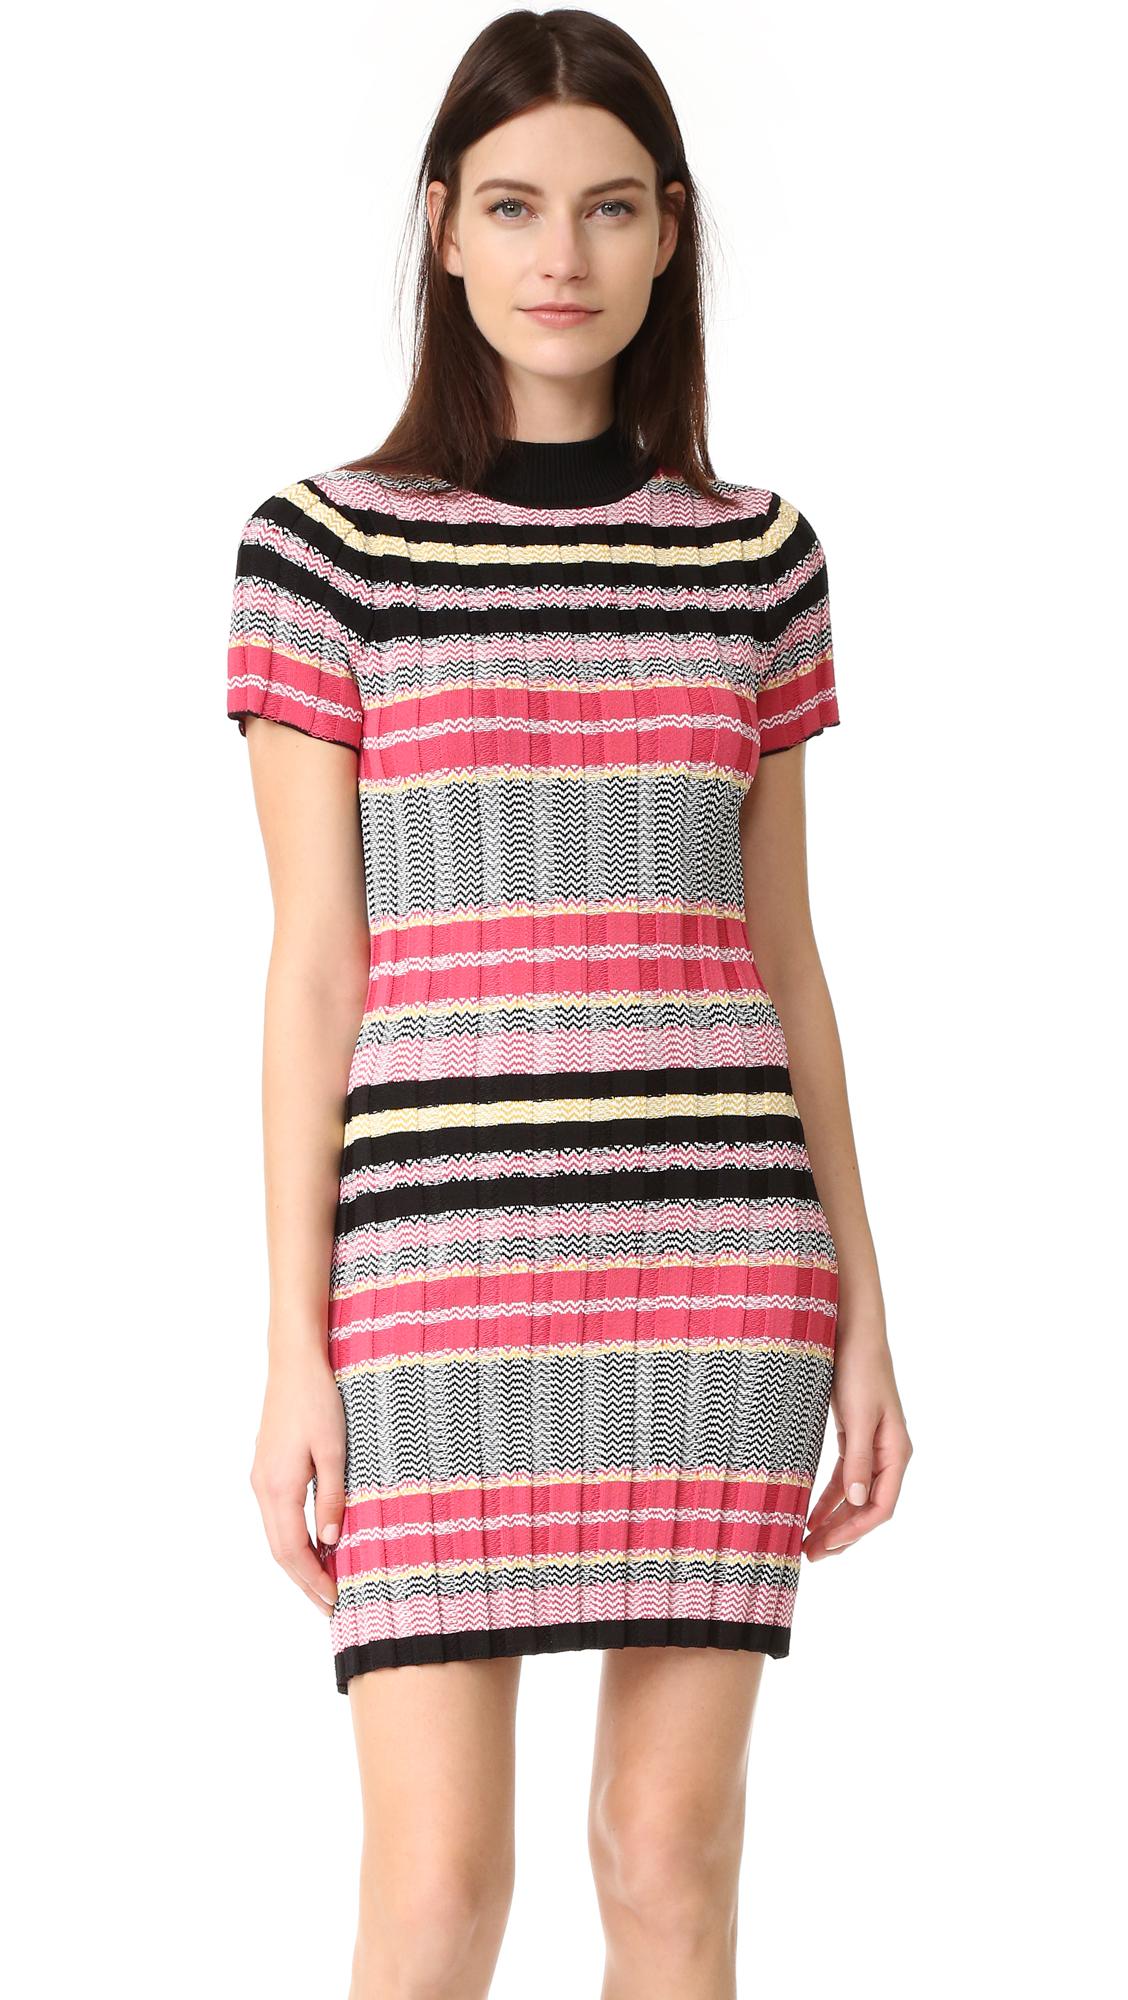 Rebecca Minkoff Burke Dress - Black Multi Stripe